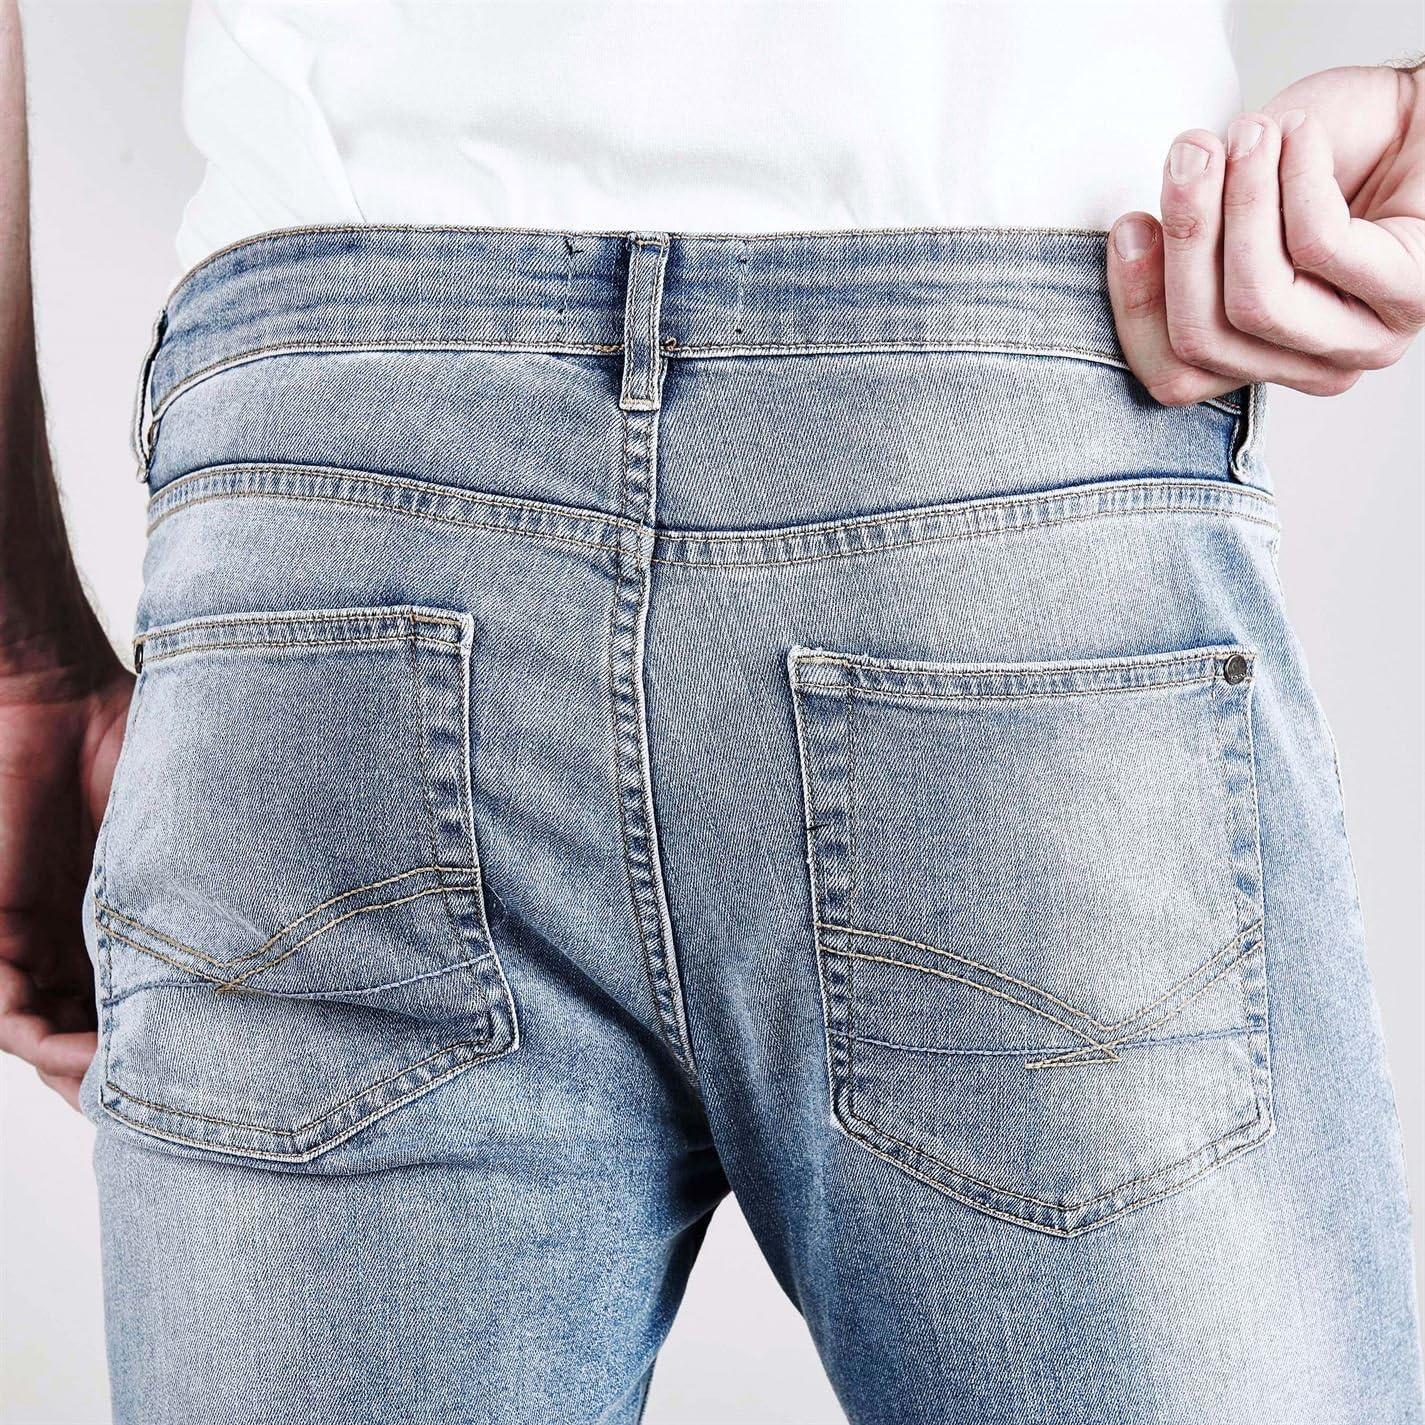 Firetrap Mens Skinny Jeans Tonal Stitching Denim Trousers Casual Pants Bottoms Bleach Wash